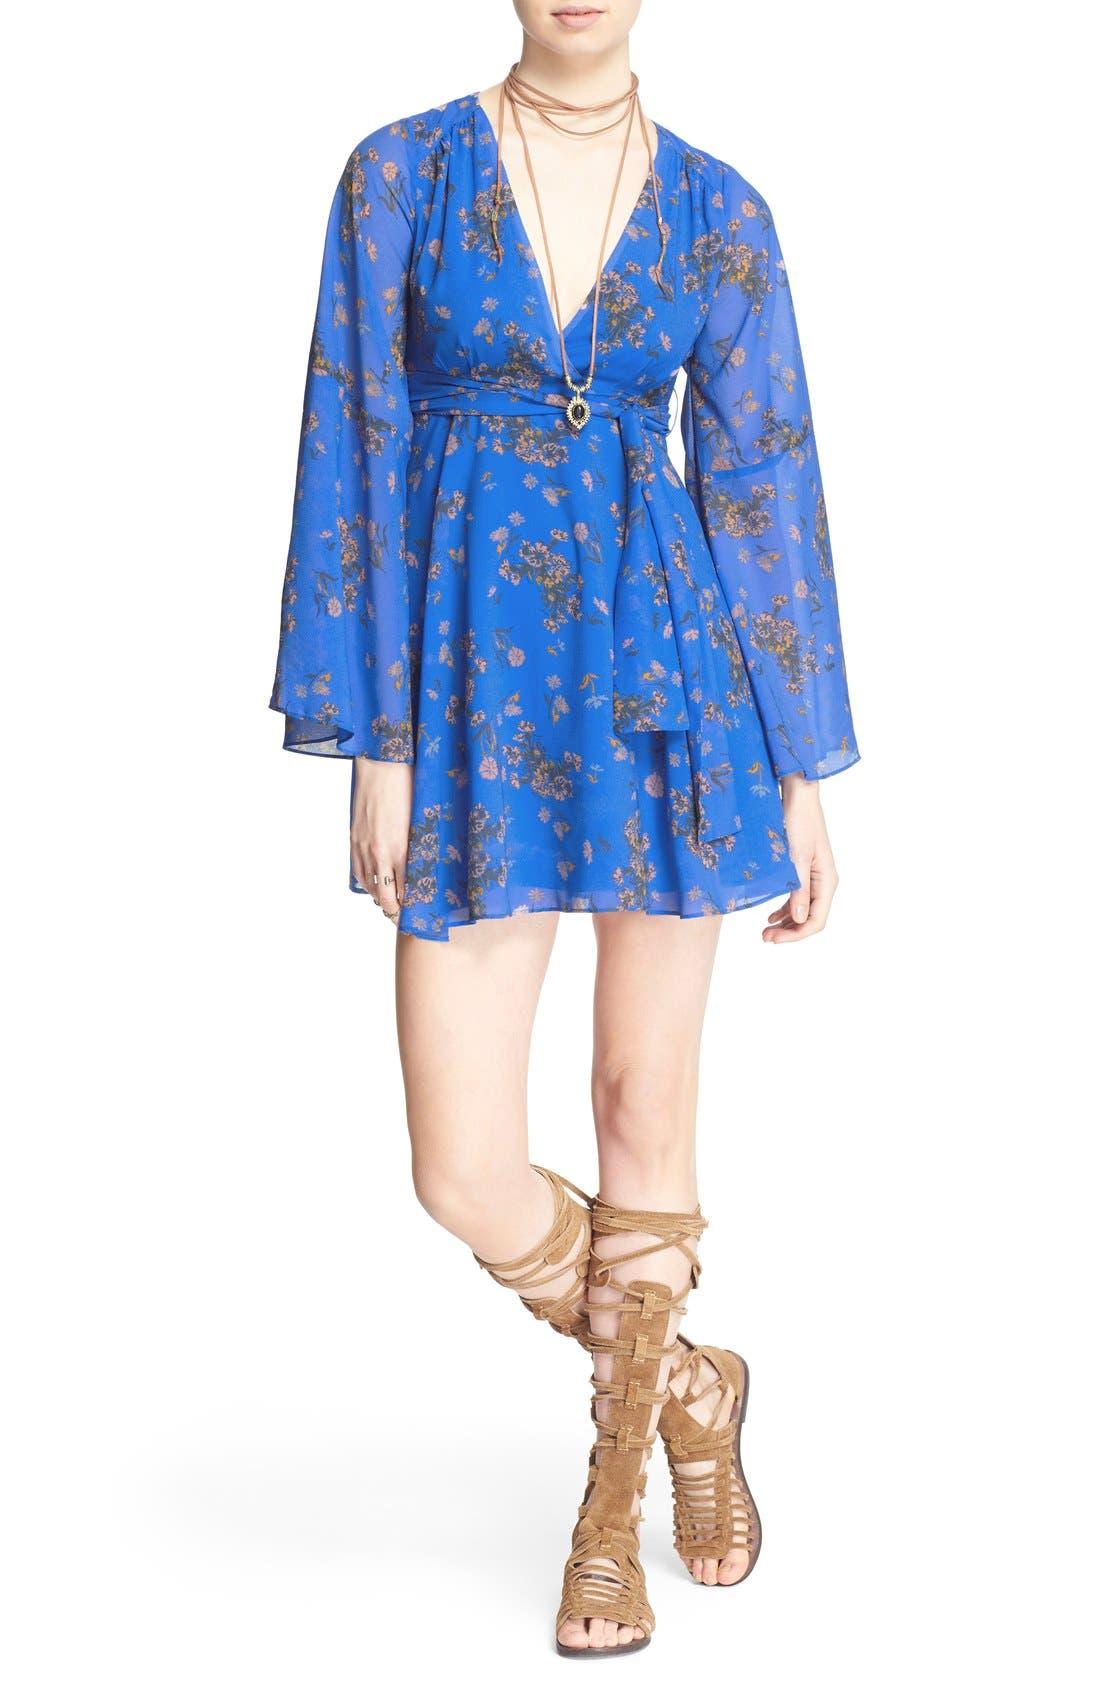 Alternate Image 1 Selected - Free People 'Lilou' Floral Print Minidress